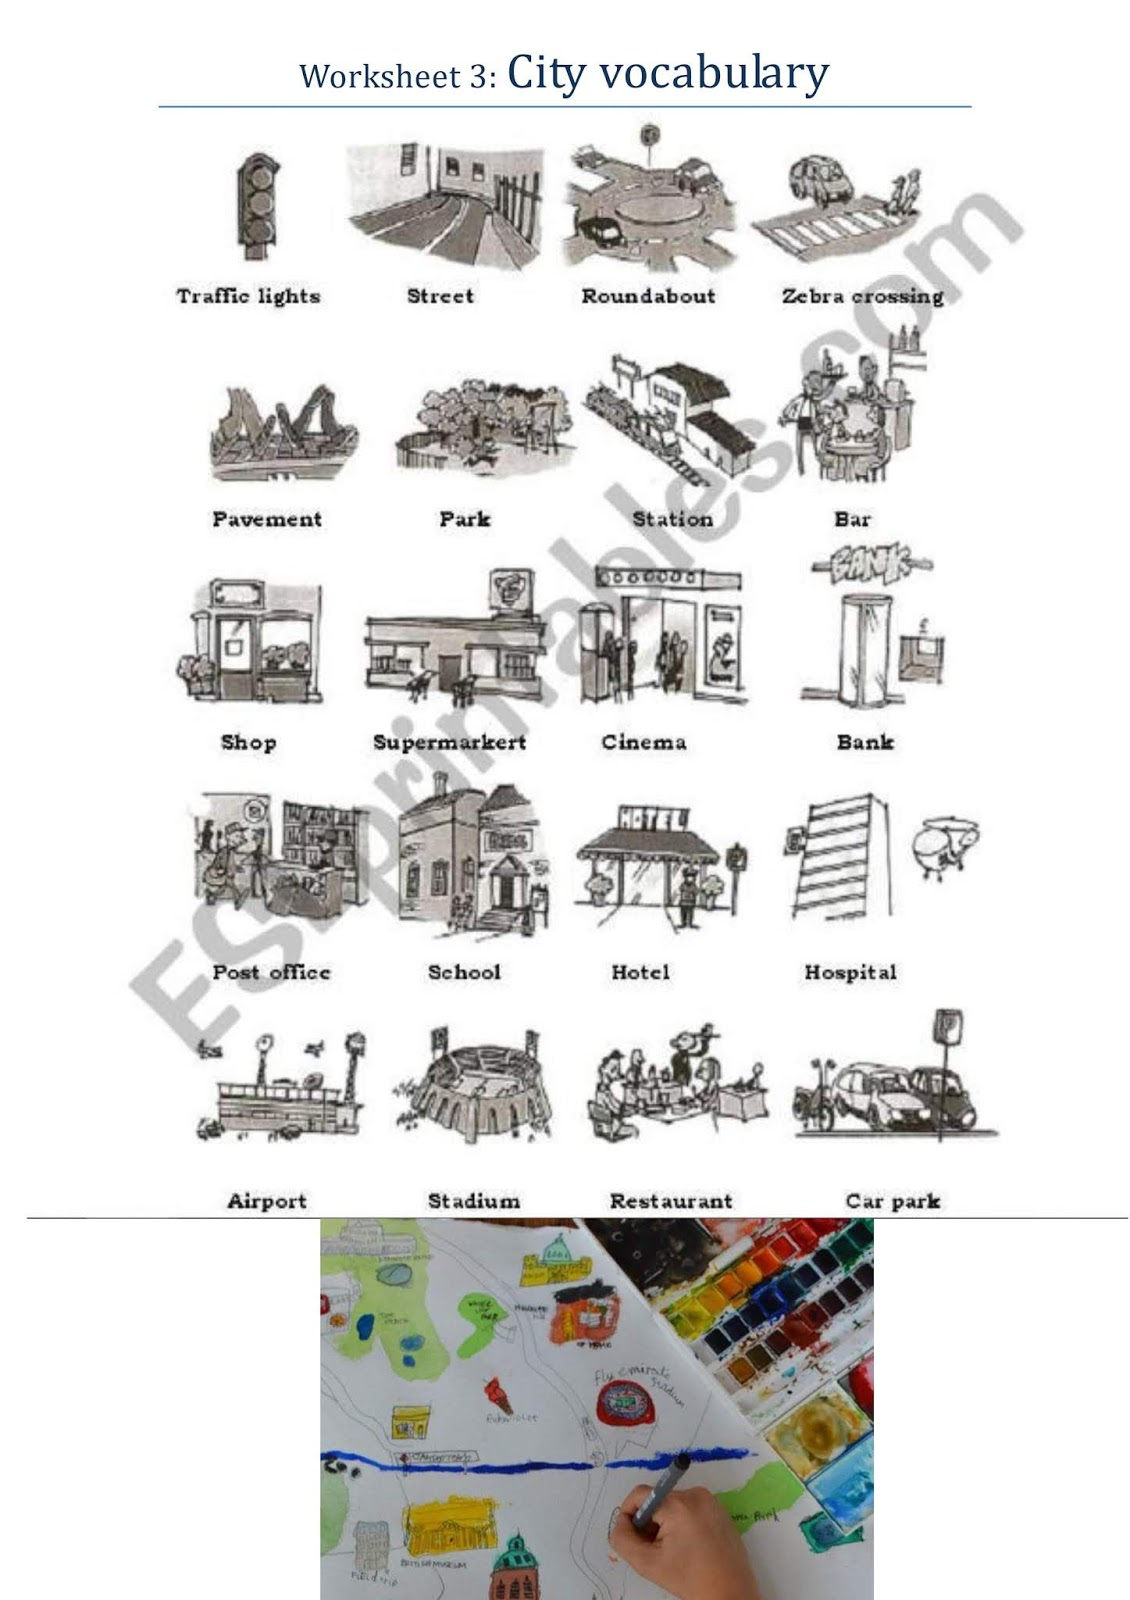 English At Ceip Portmany 6th My City Map Worksheet 3